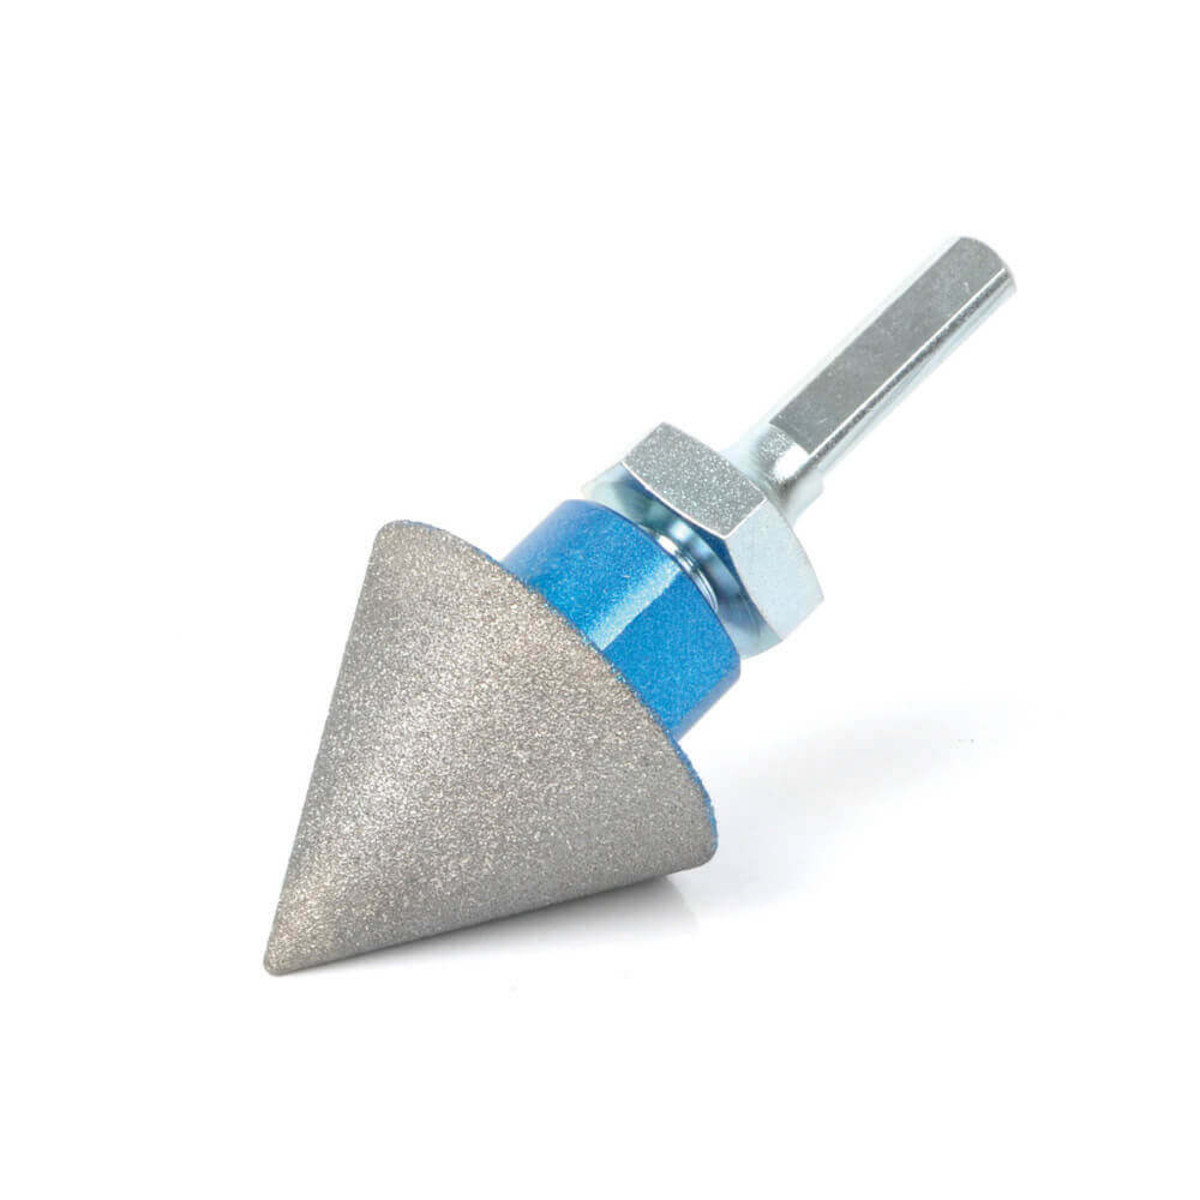 Montolit diamond Bits Counter Tops